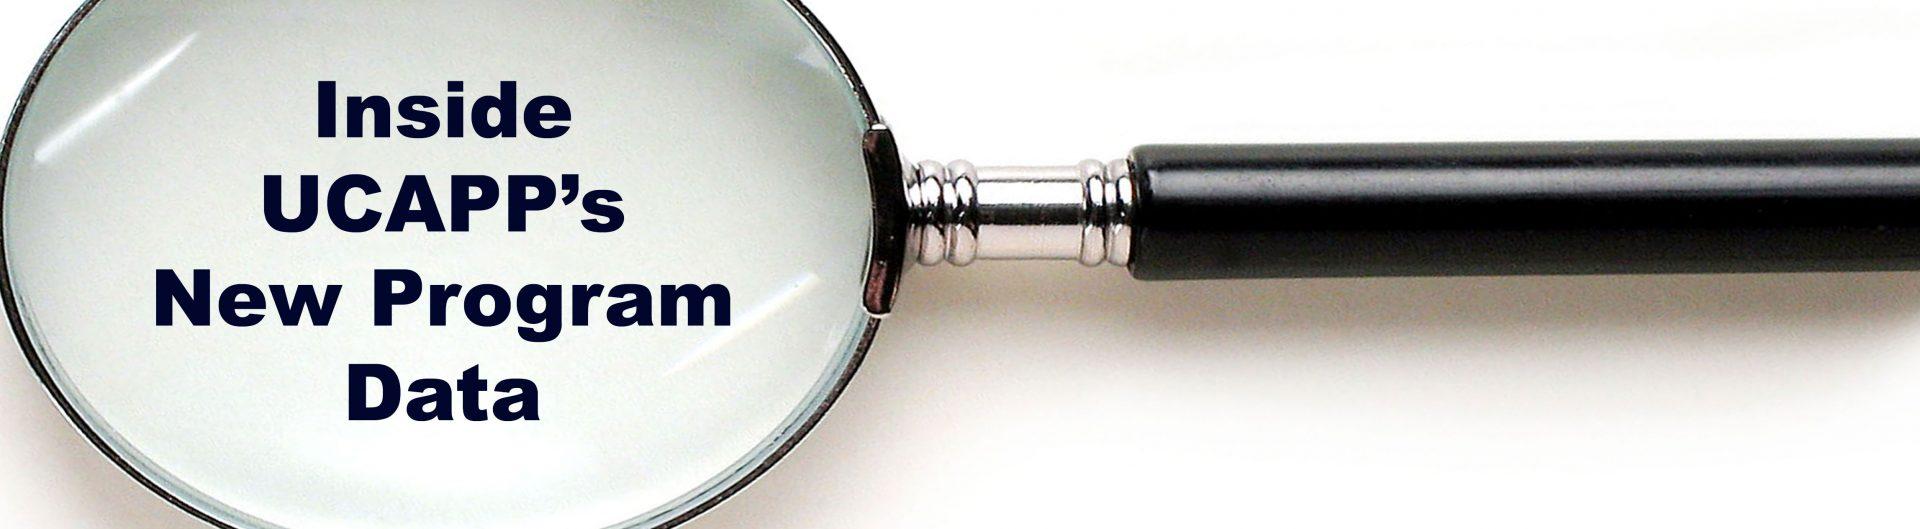 "Magnifying glass overlooking ""Inside UCAPP's new program data"""